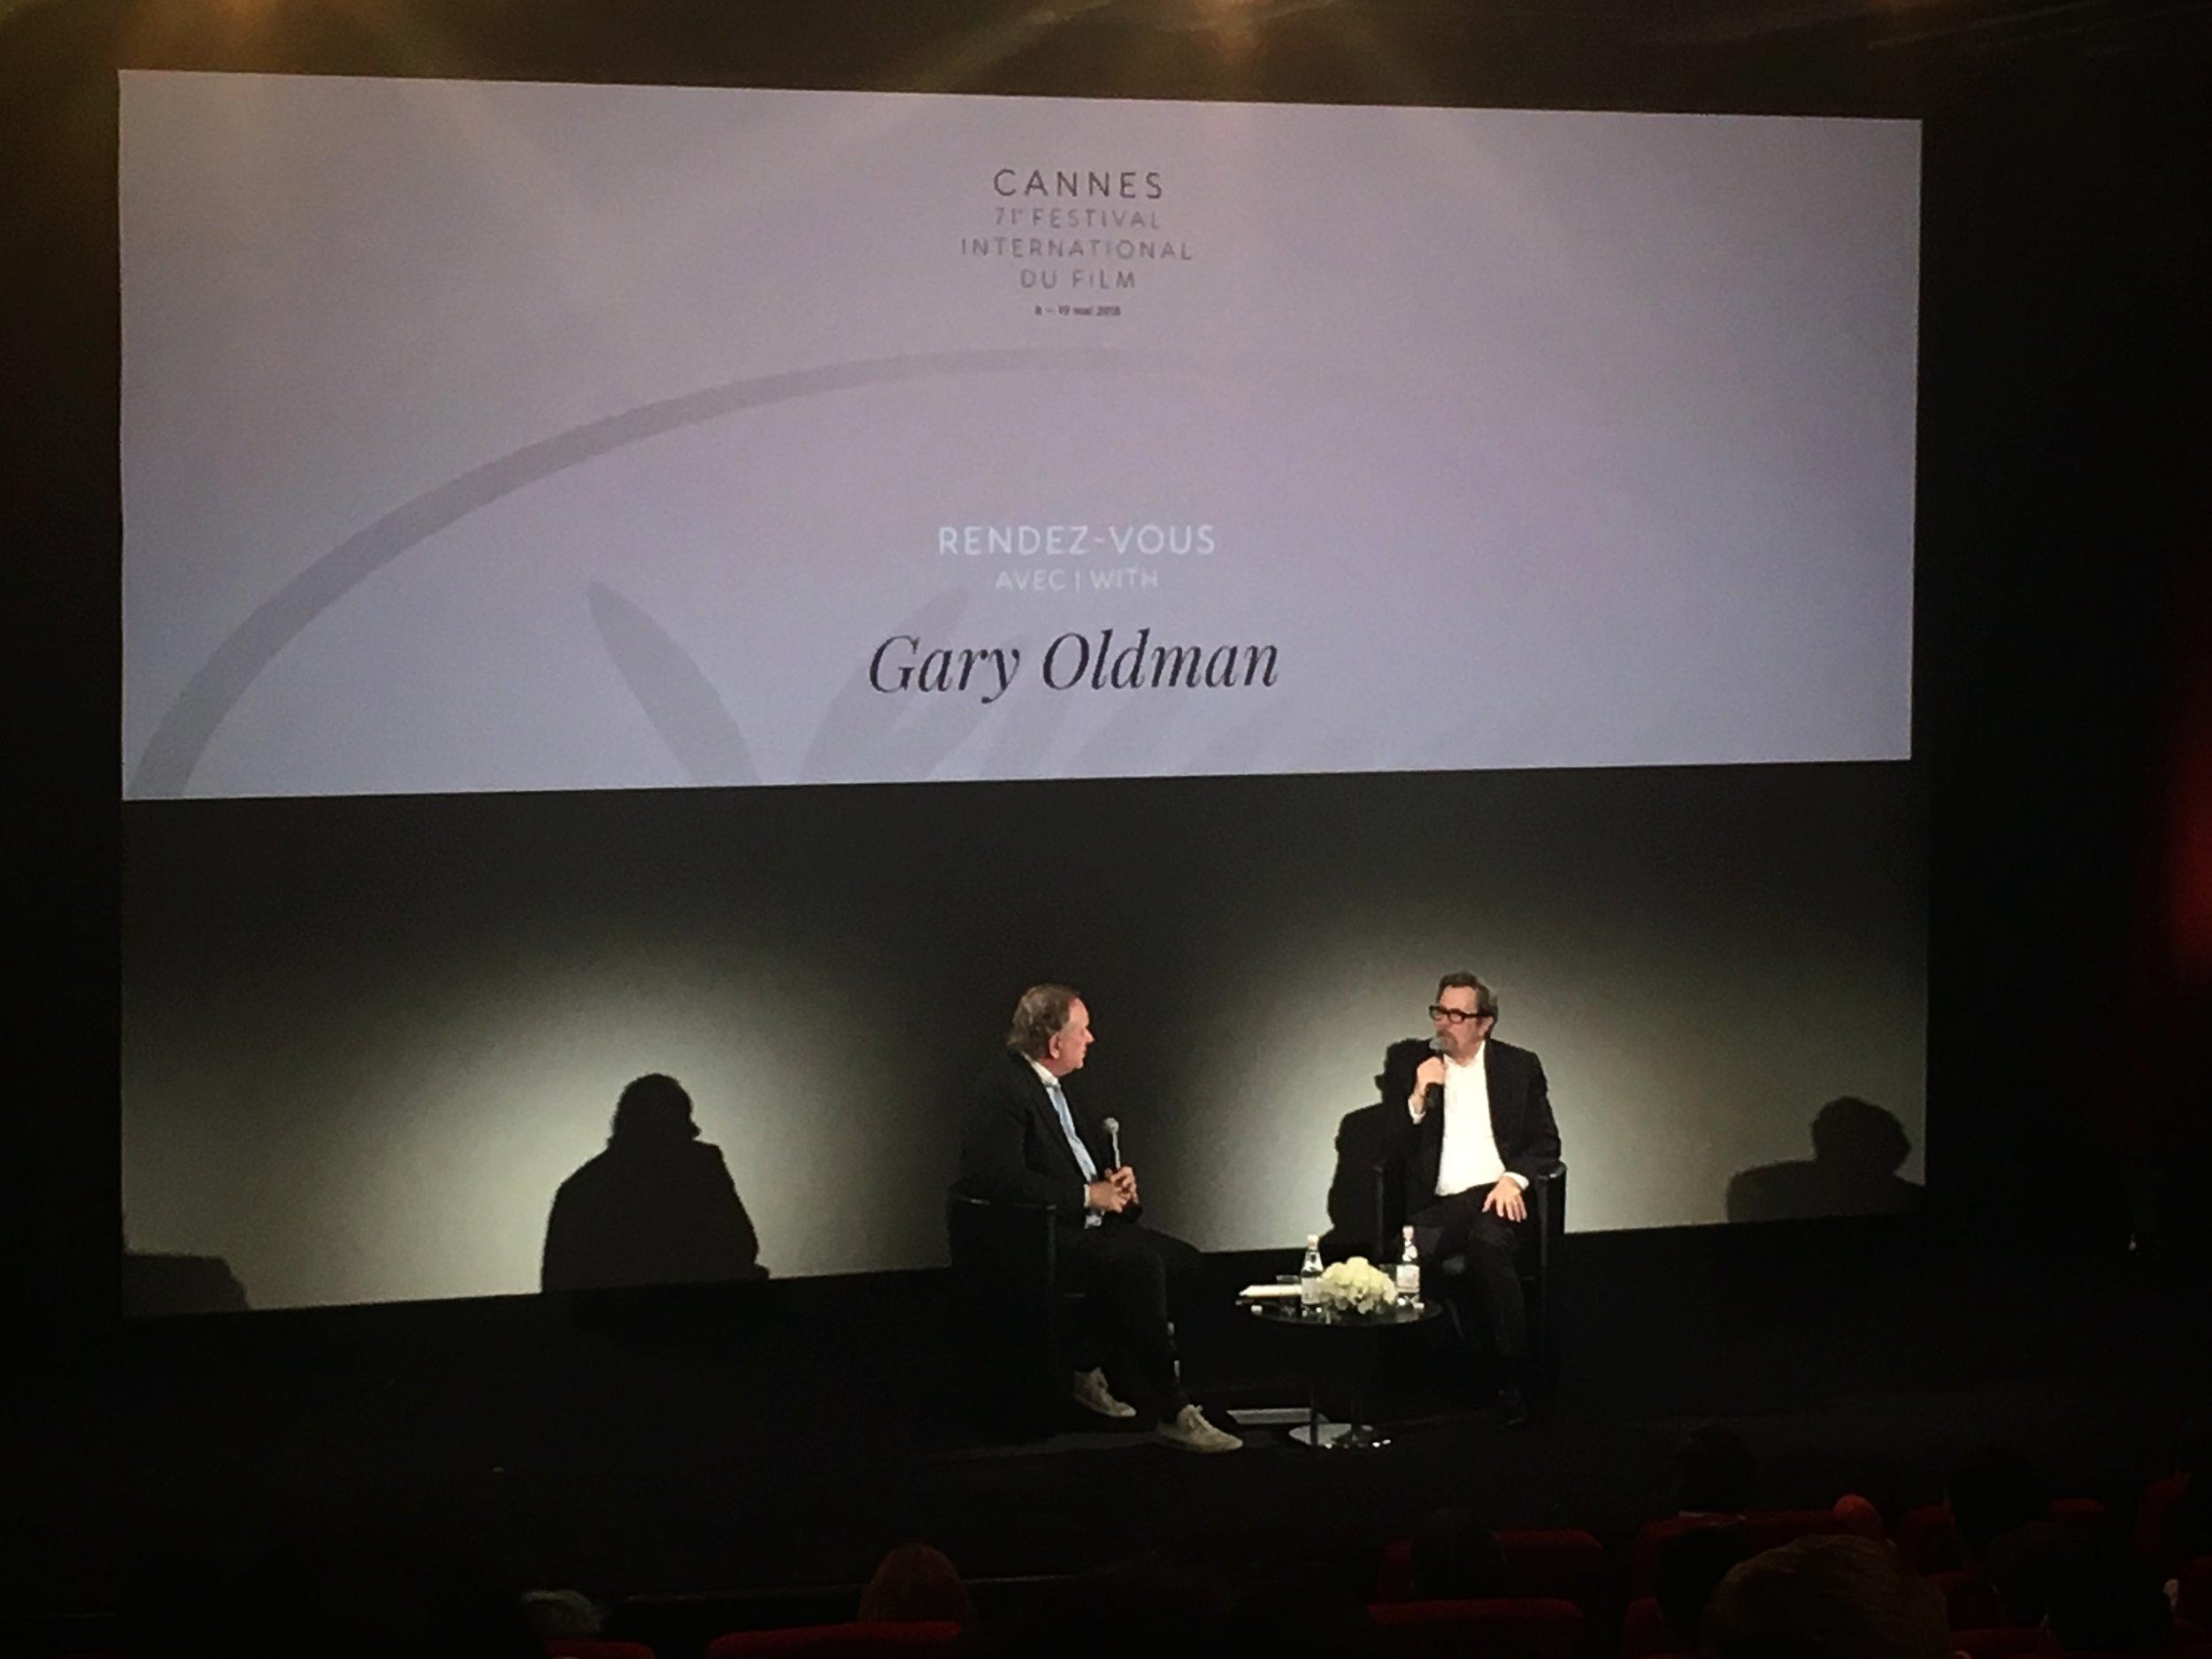 L-R Douglas Urbanski and Gary Oldman in conversation at the 71st Festival de Cannes / courtesy of I AM FILM